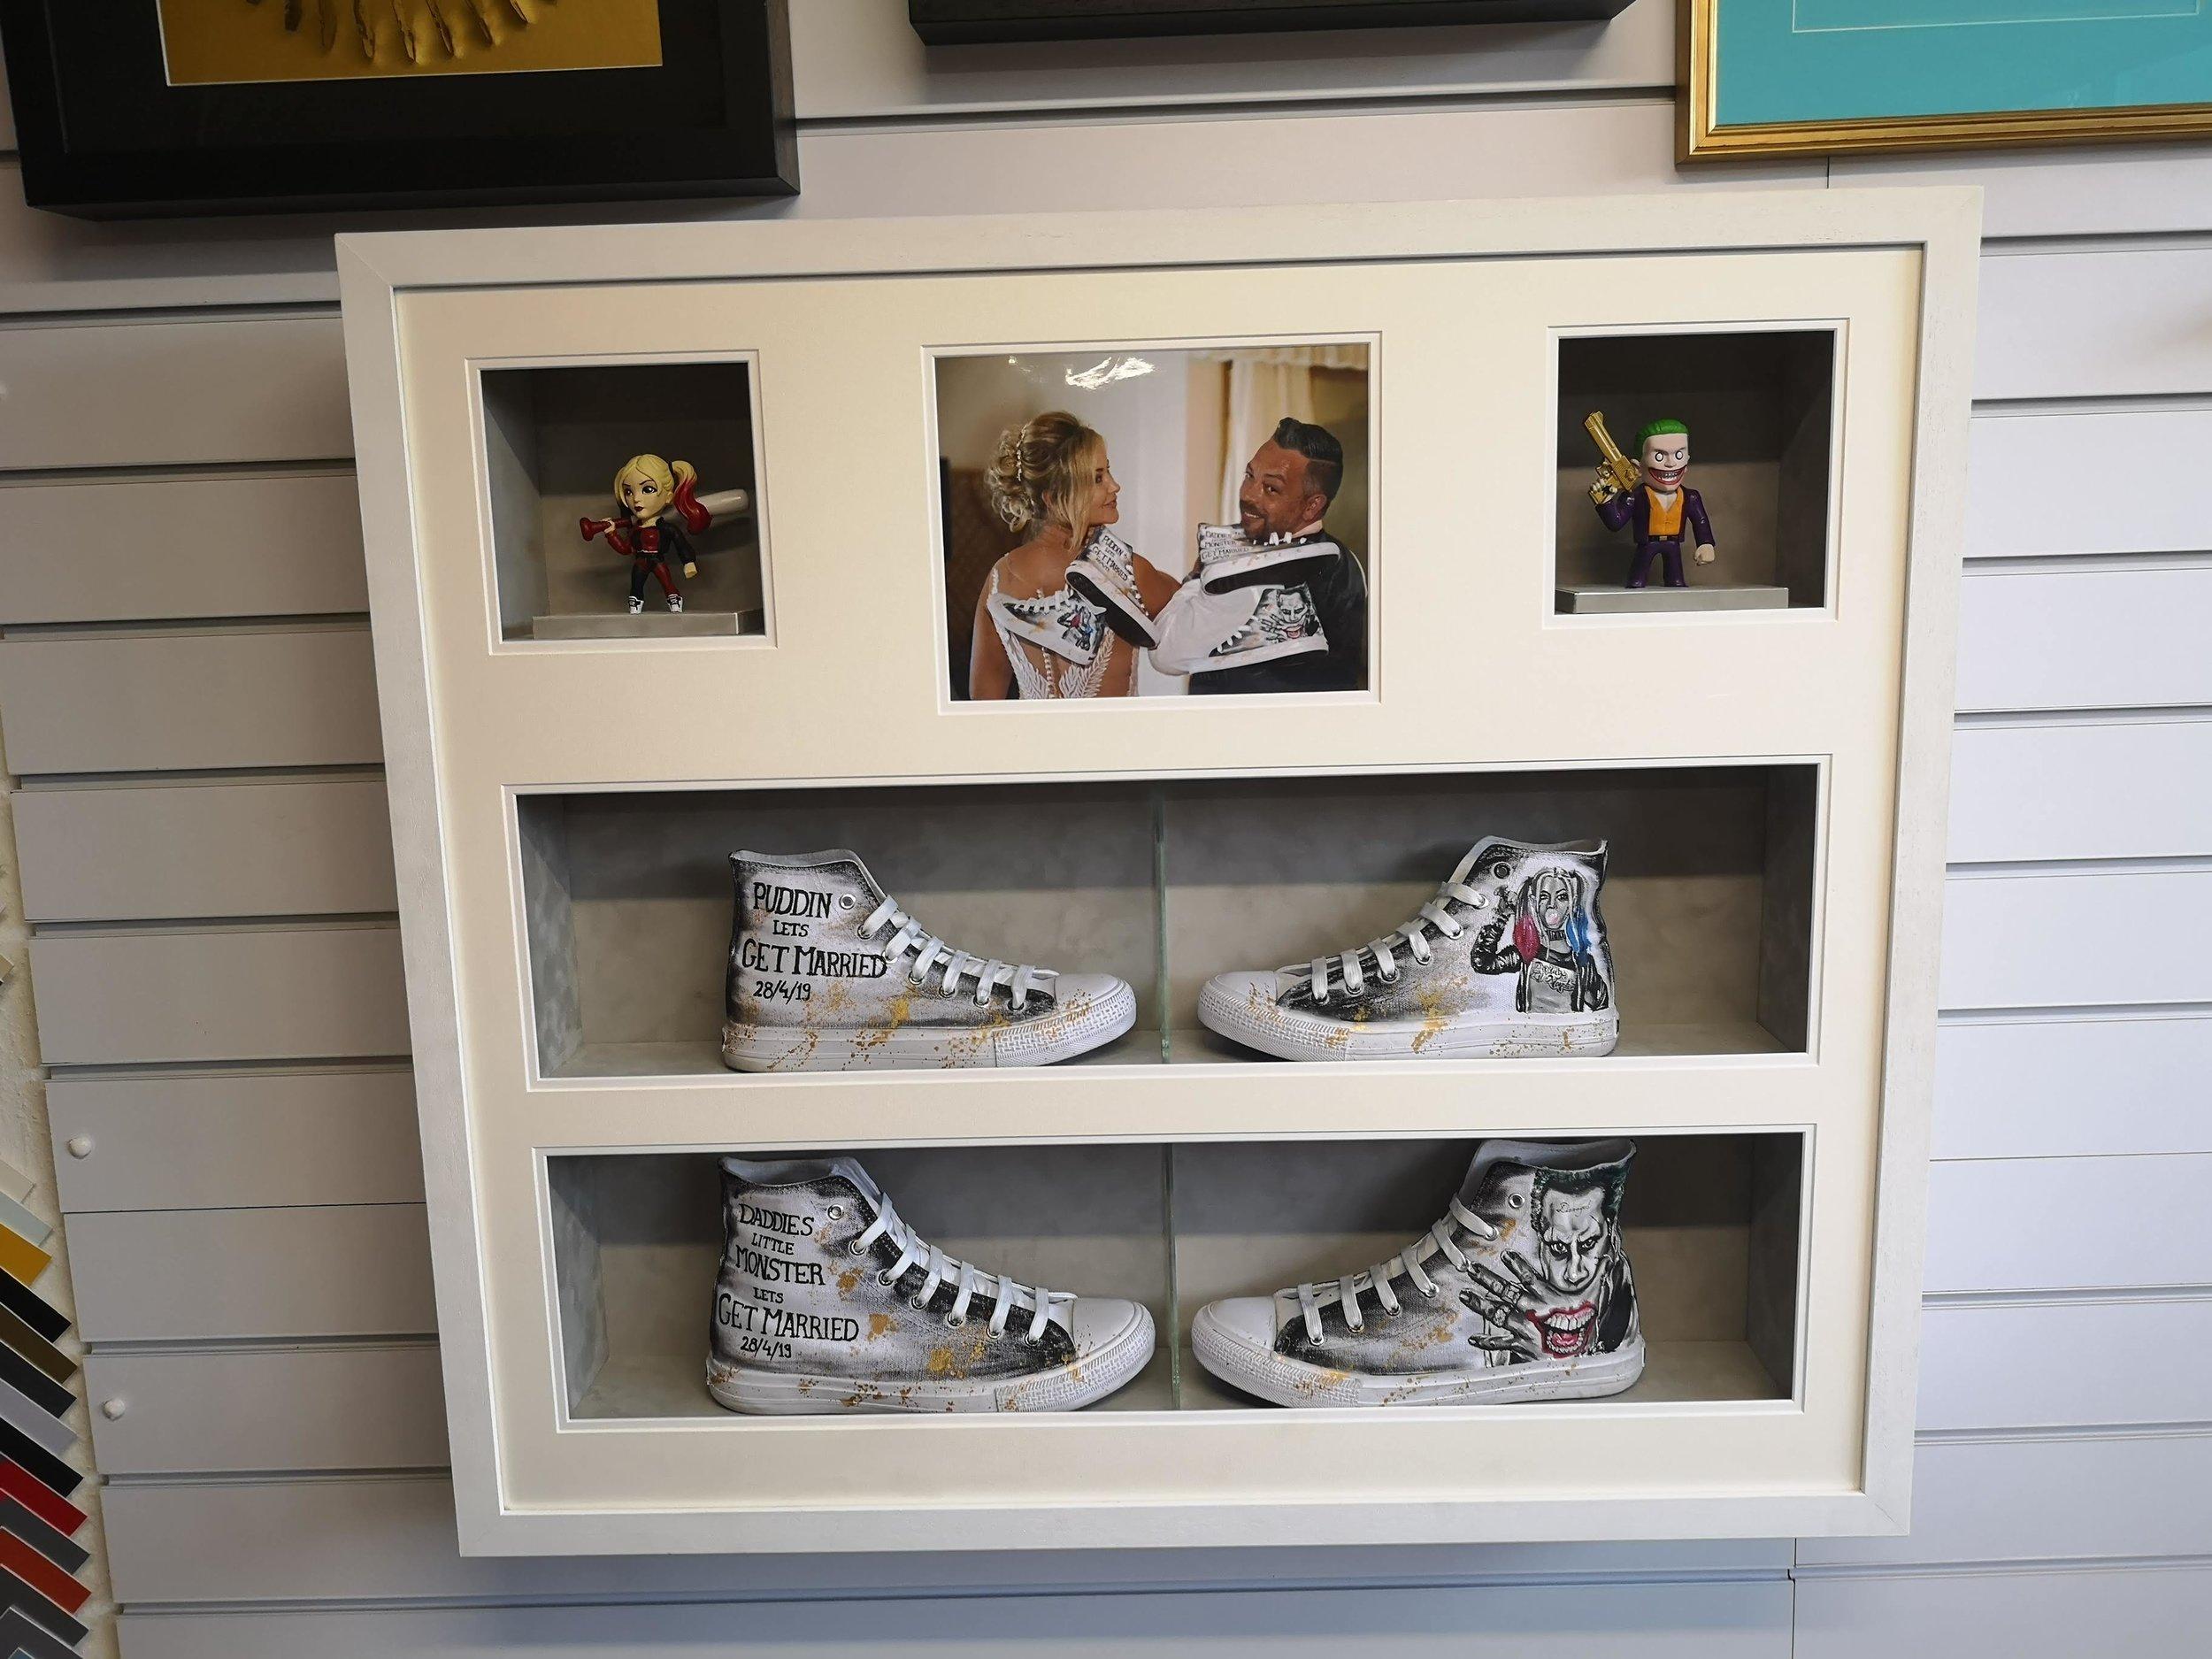 crayford-picture-framing-framed-converse-marvel-harley-quinne-joker-shoes-wedding.jpg